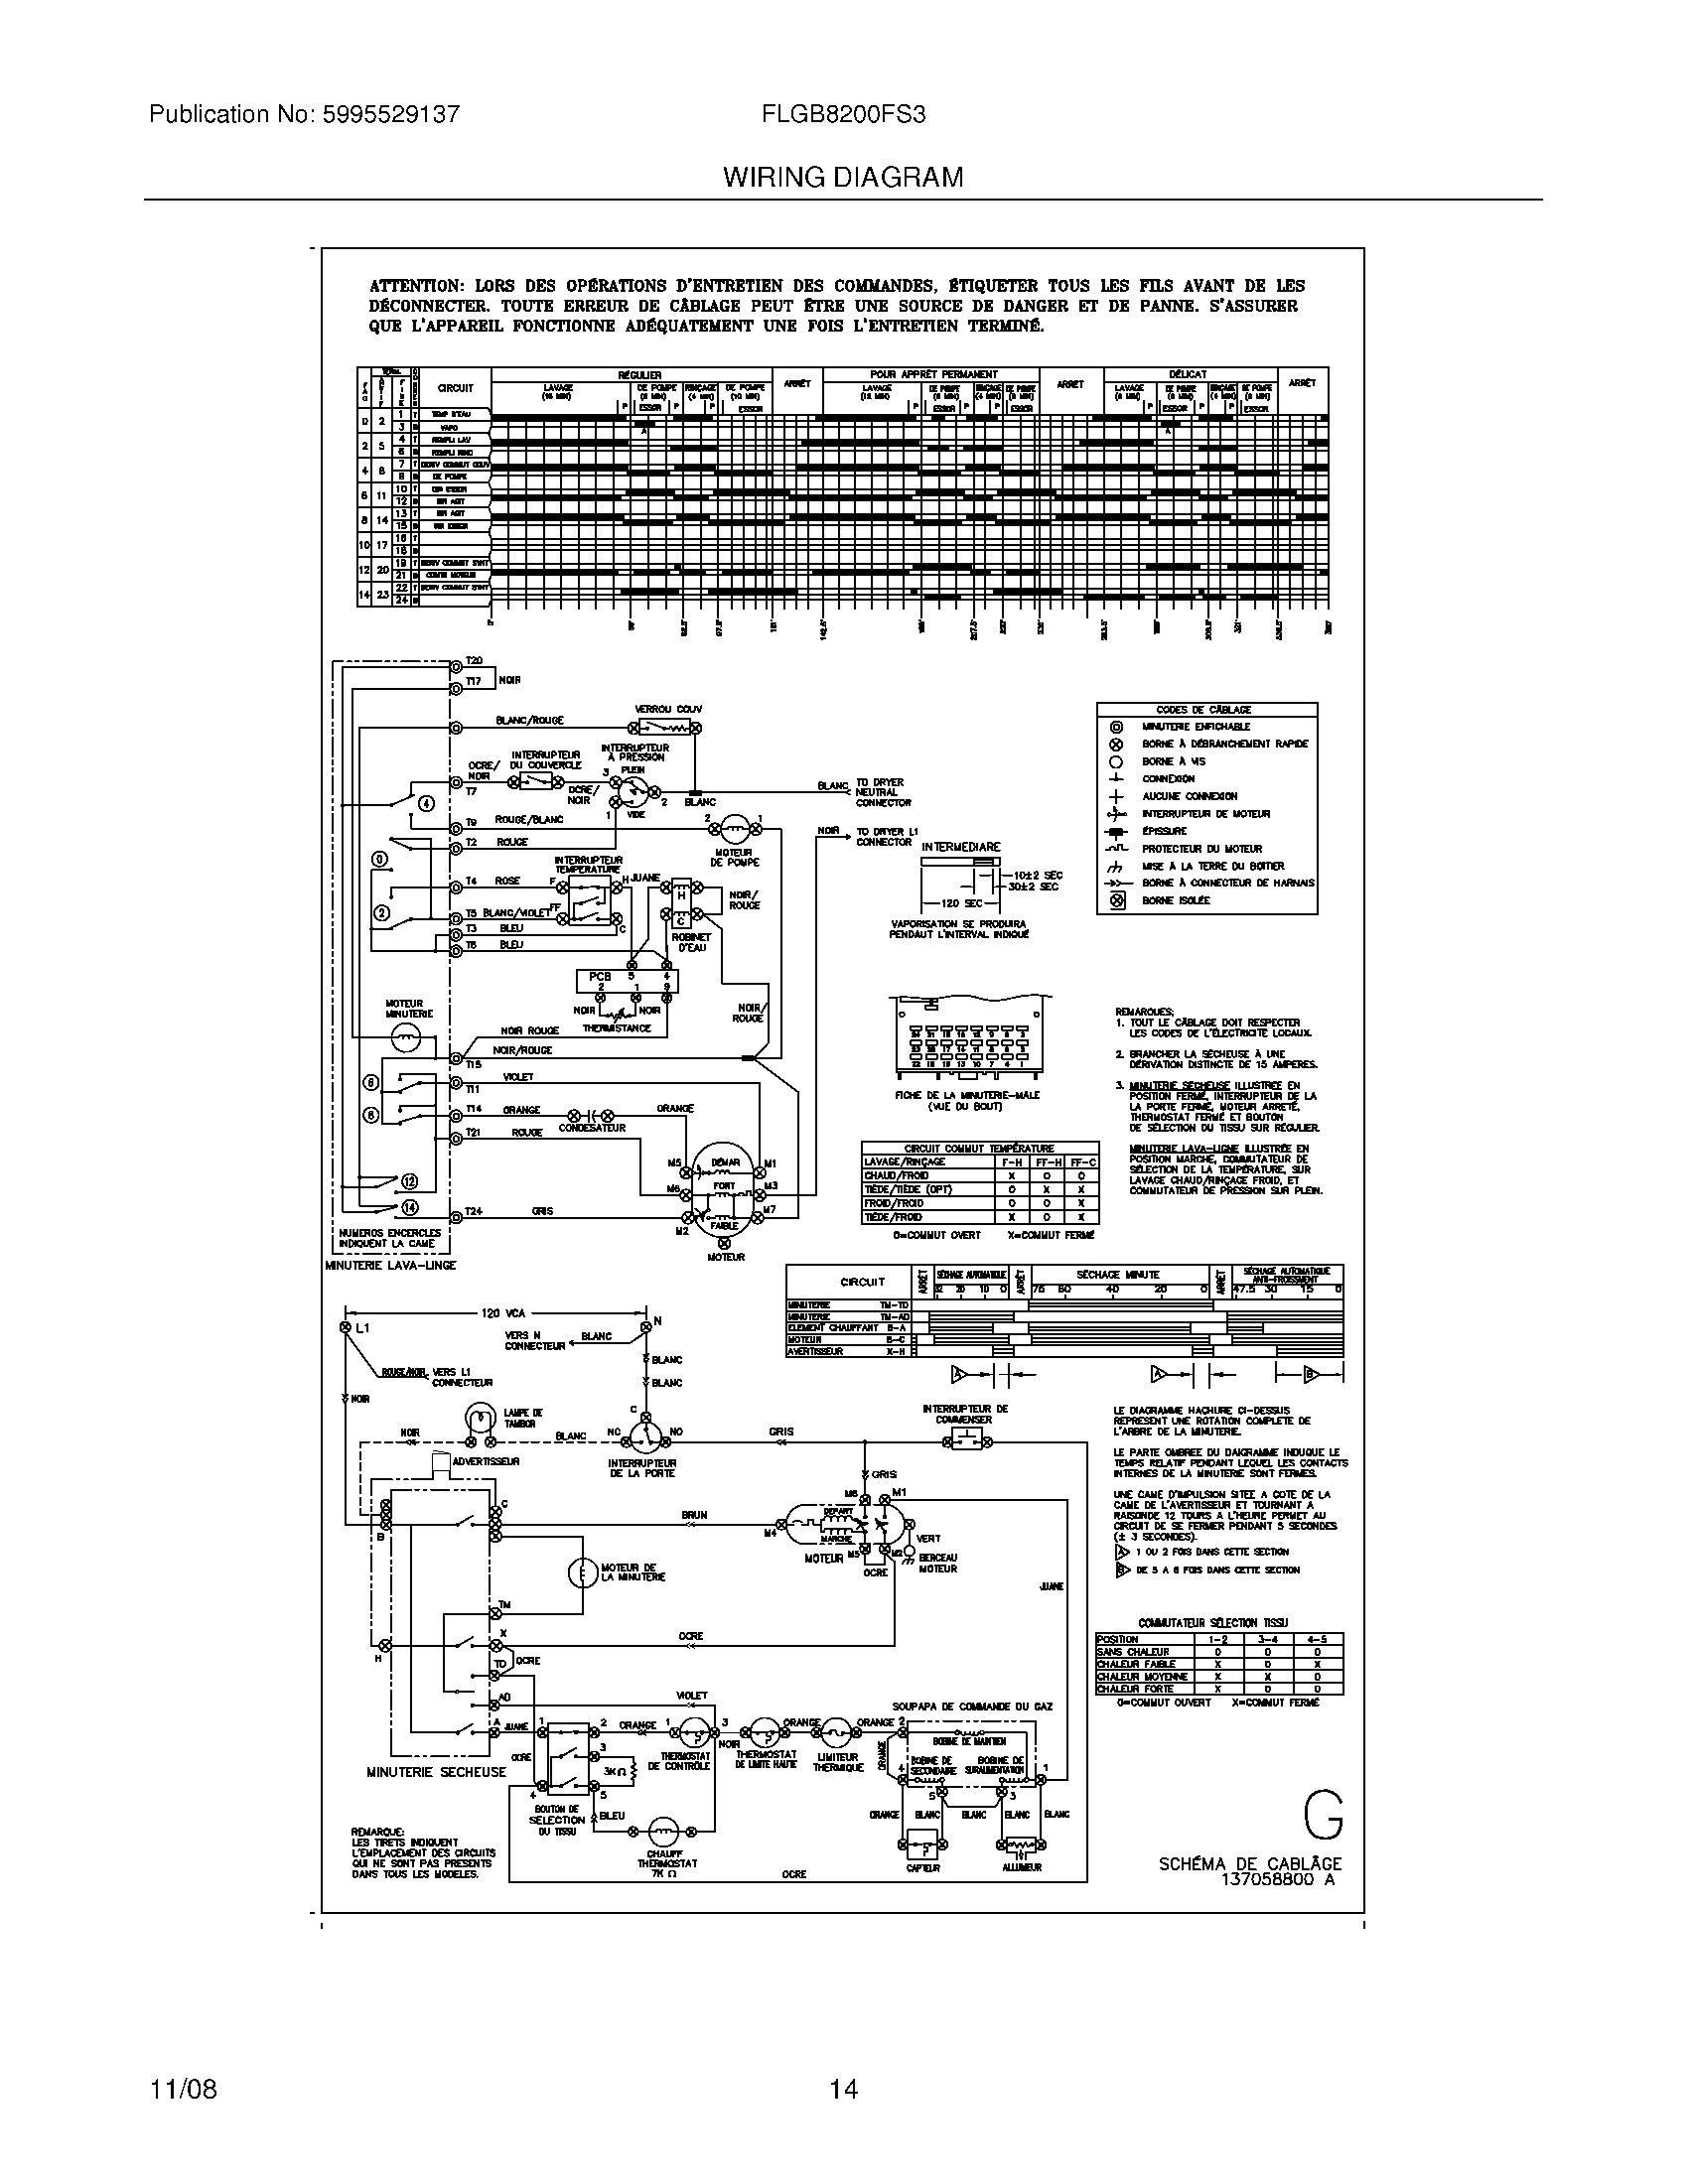 Beam Vacuum Wiring Diagram Detailed Schematics Electrolux Refrigerator Schematic 2100 Central Manual Whirlpool